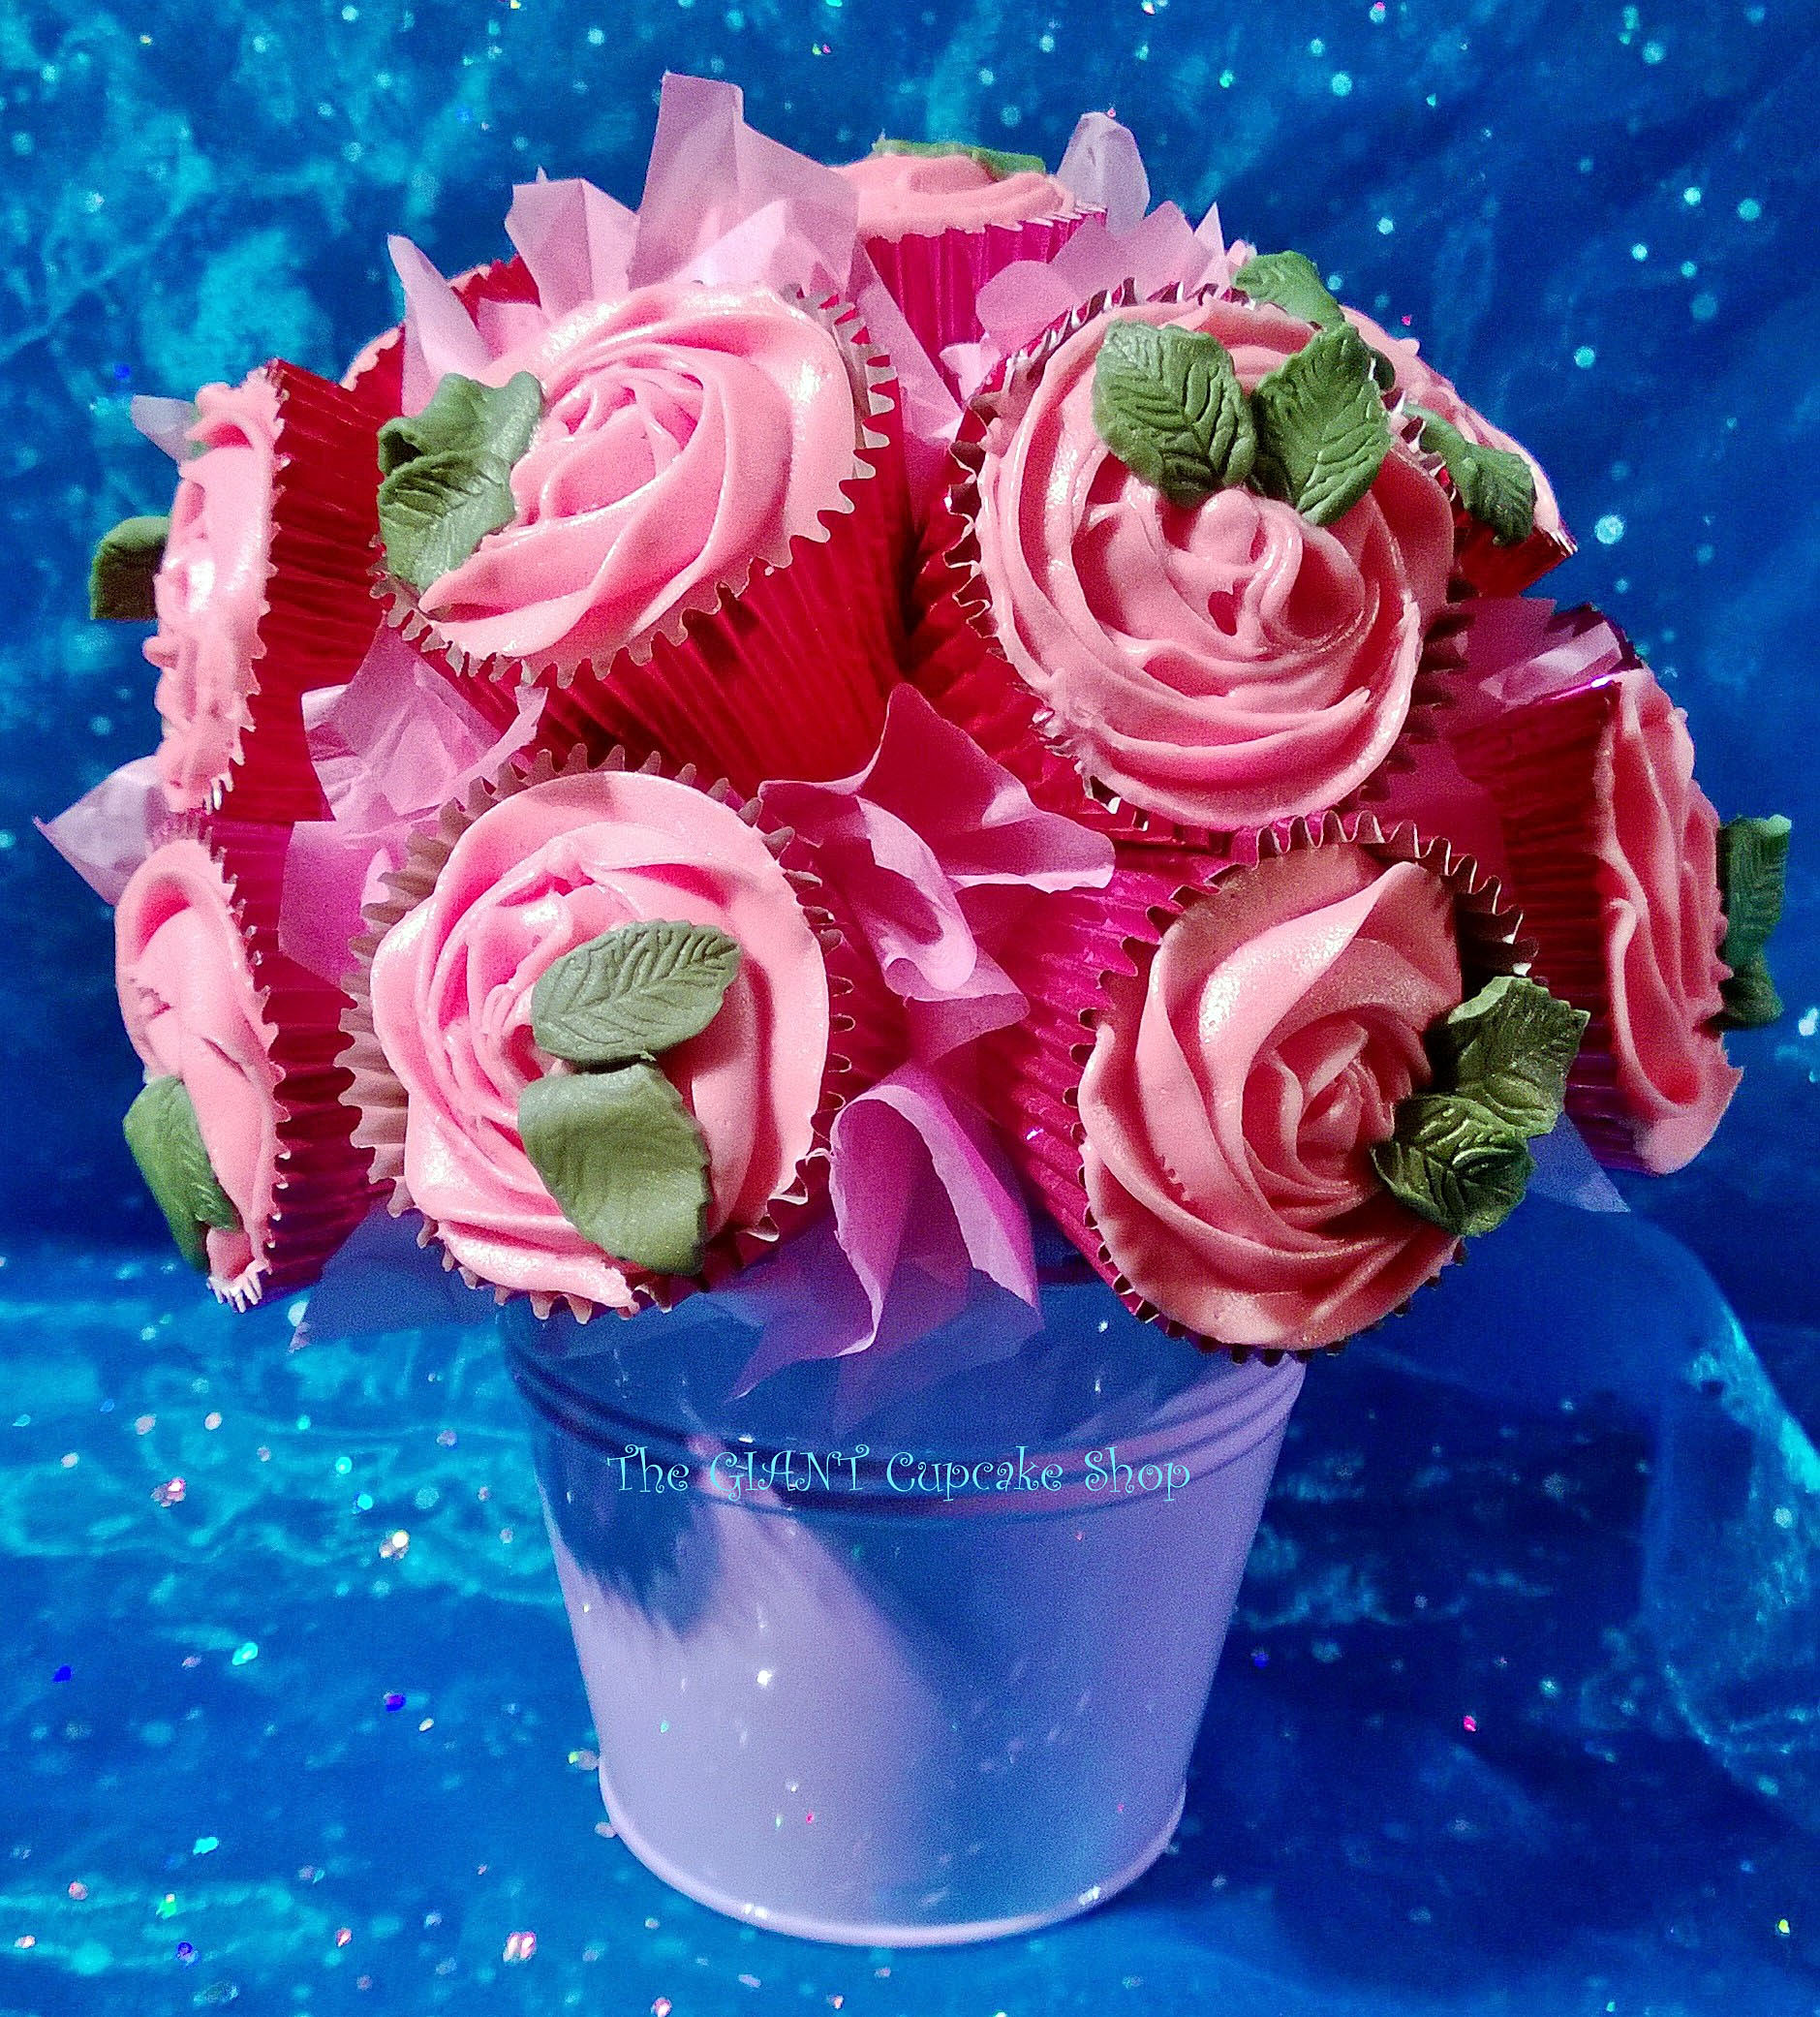 Wedding Bouquets Northamptonshire : Amelia rose cake studio wedding cakes northamptonshire